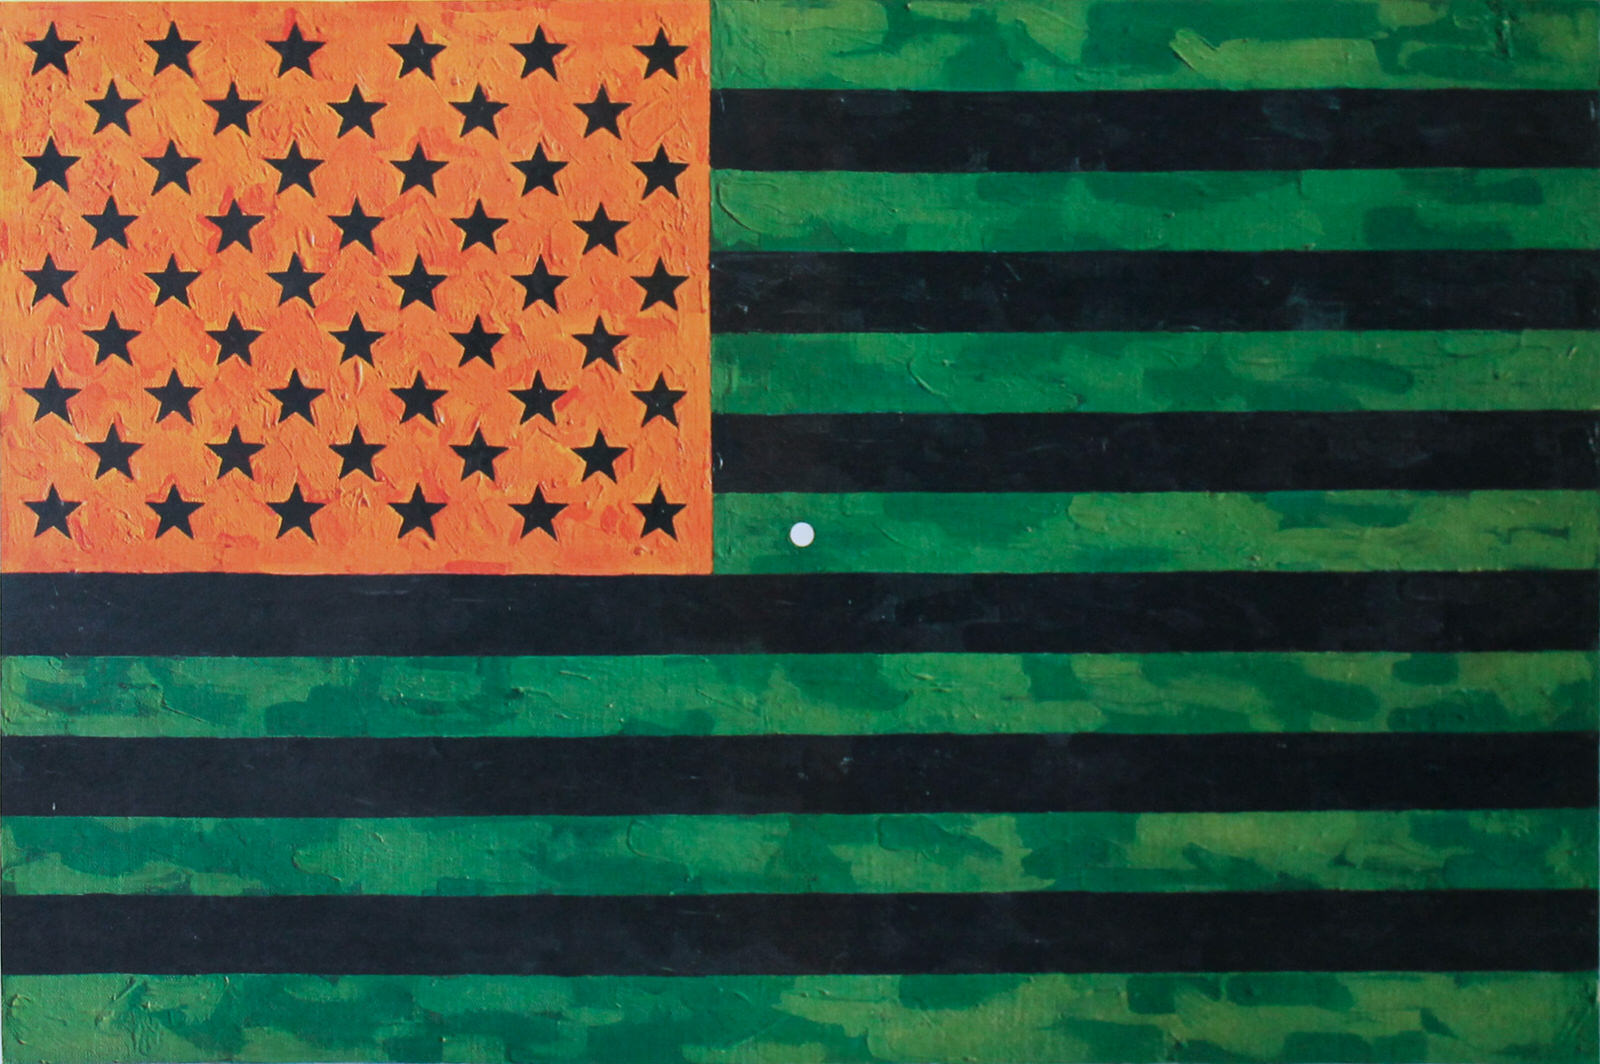 Jasper Johns, Flag, 1969 (Moratorium), offset lithograph. Found on Artnet.